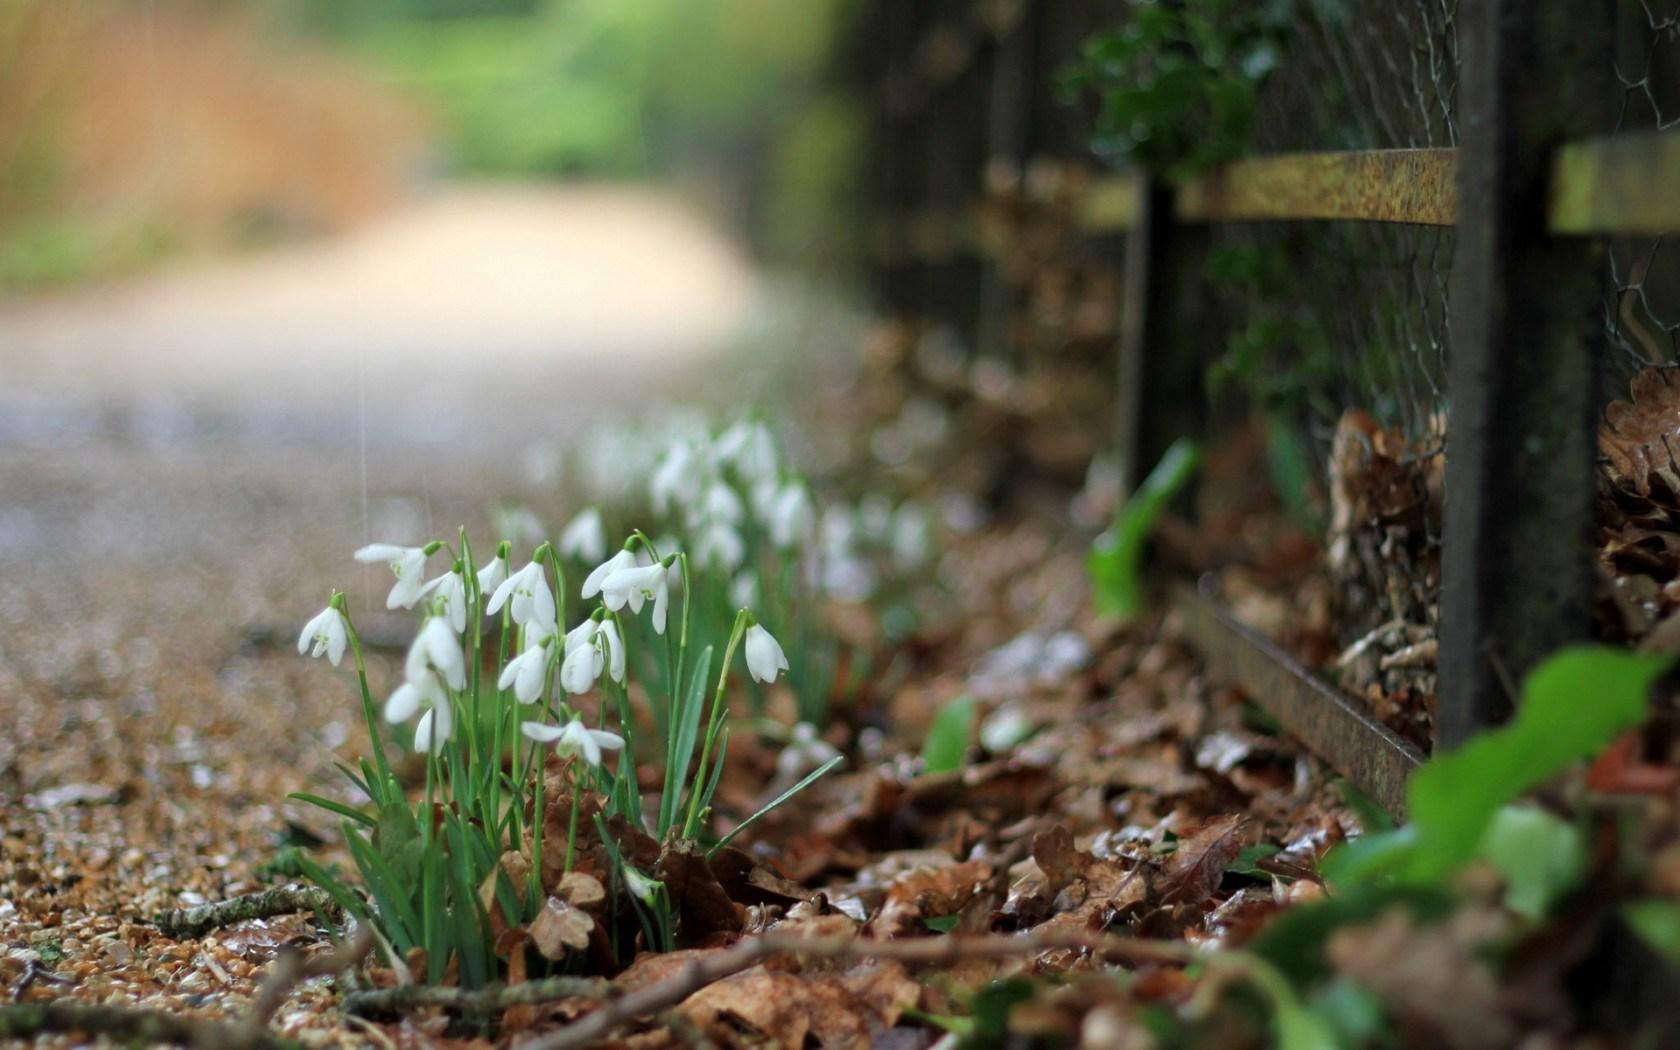 flowers spring dew drops